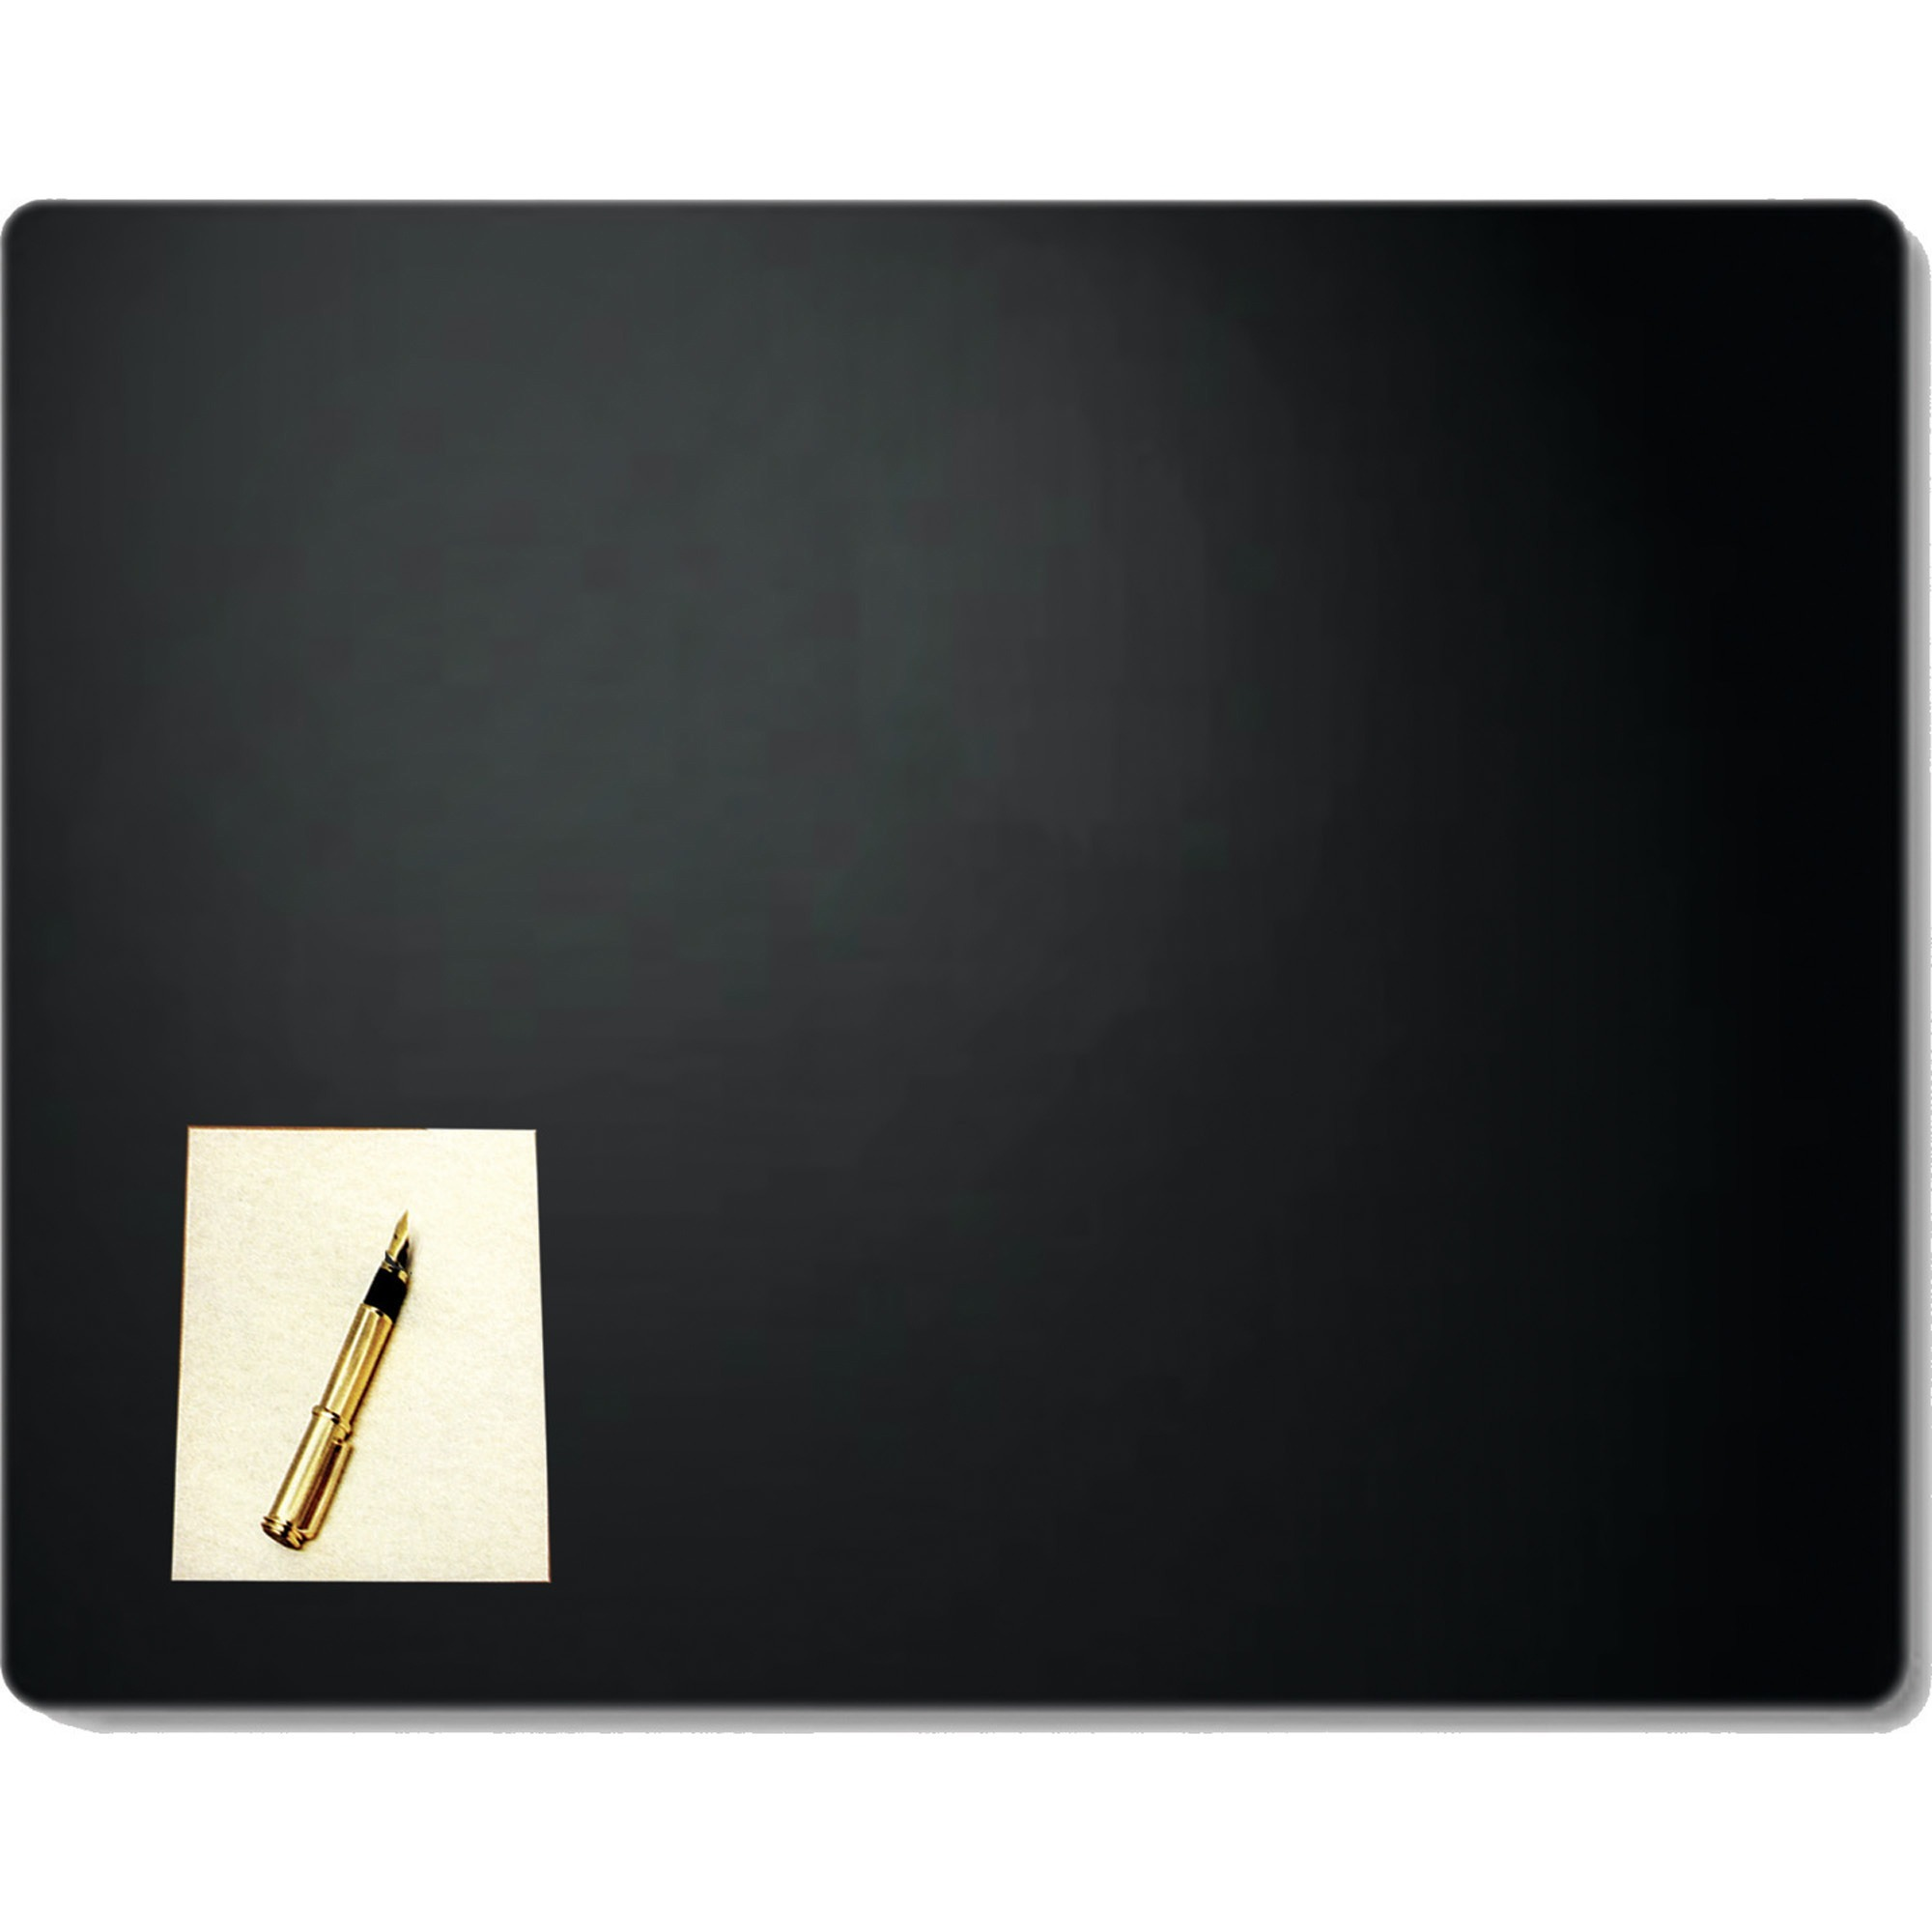 Artistic Plain Leather Desk Pads Rectangle 19 482 60 Mm Width